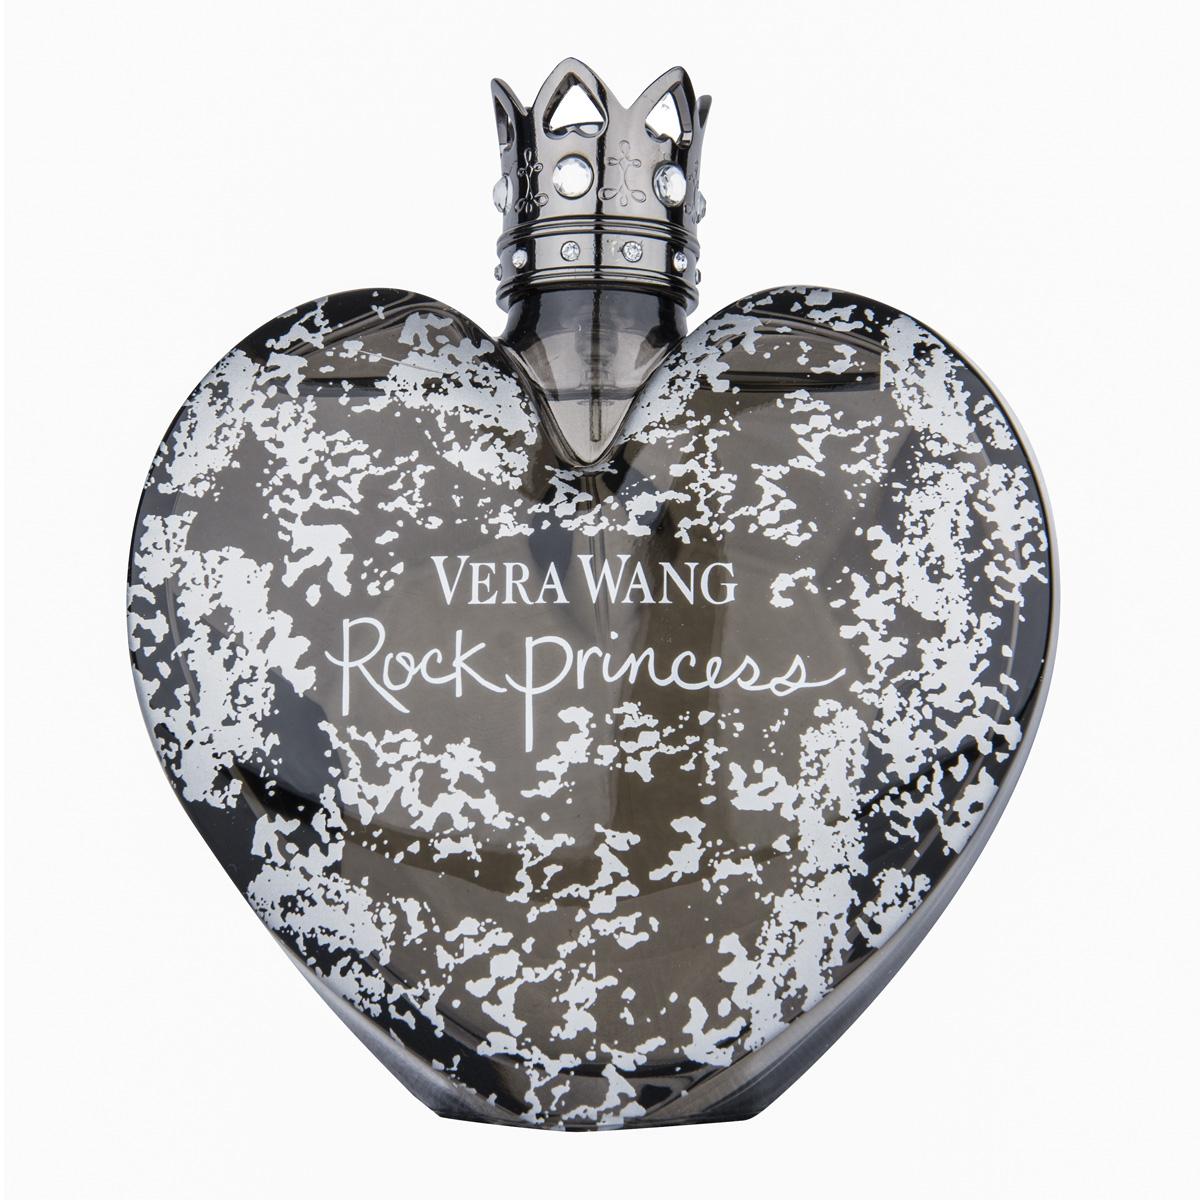 Vera Wang Rock Princess Eau de Toilette